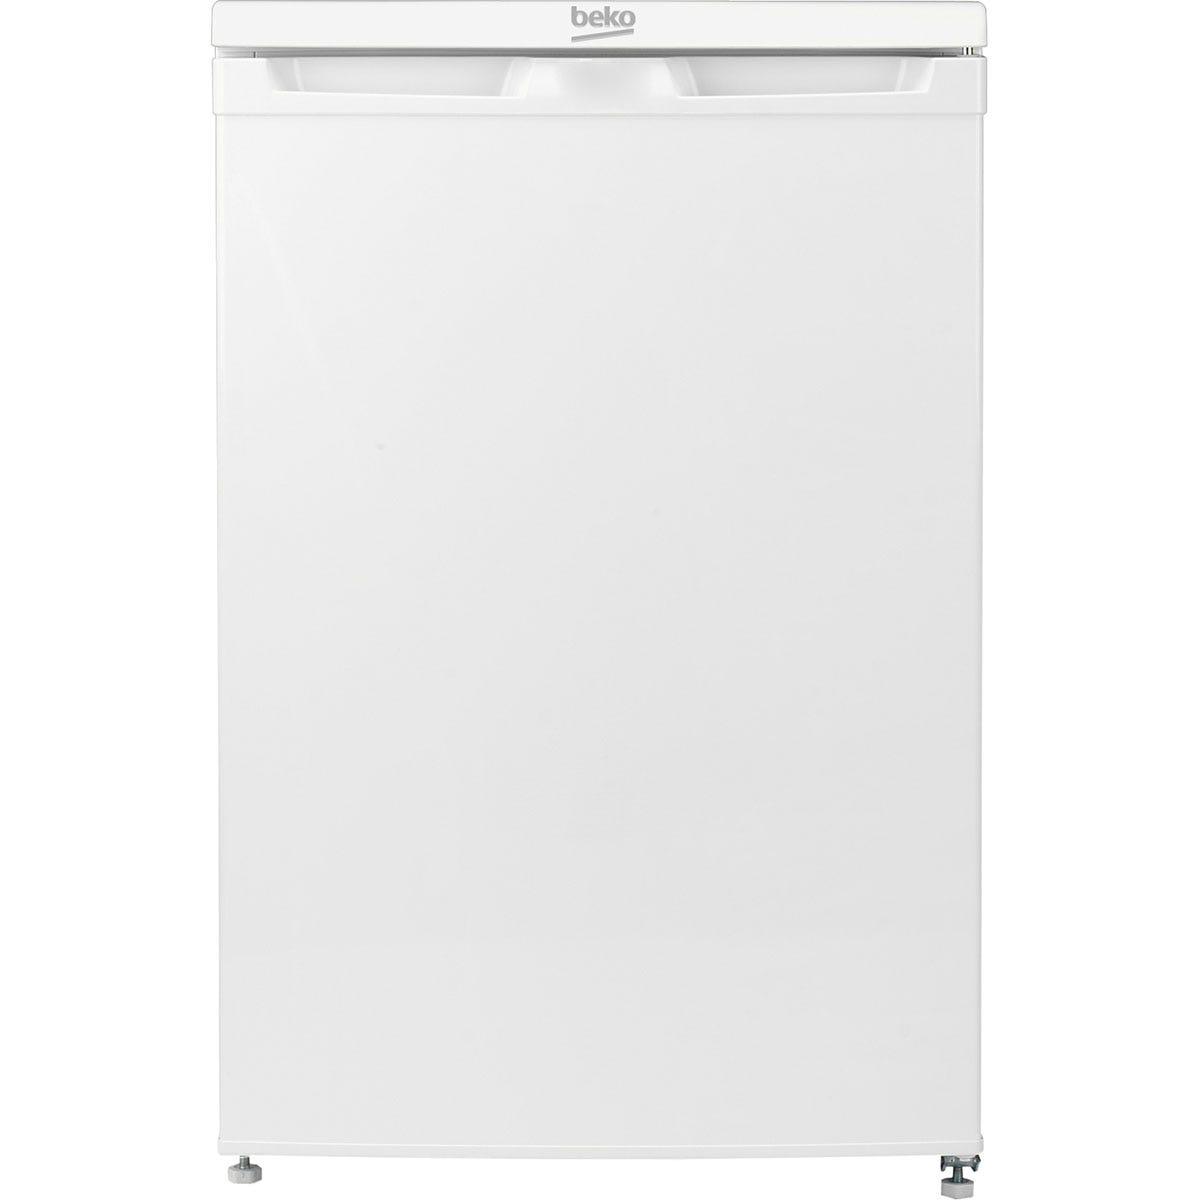 Beko UFF584APW Freestanding Frost-Free 75L Under Counter Freezer - White